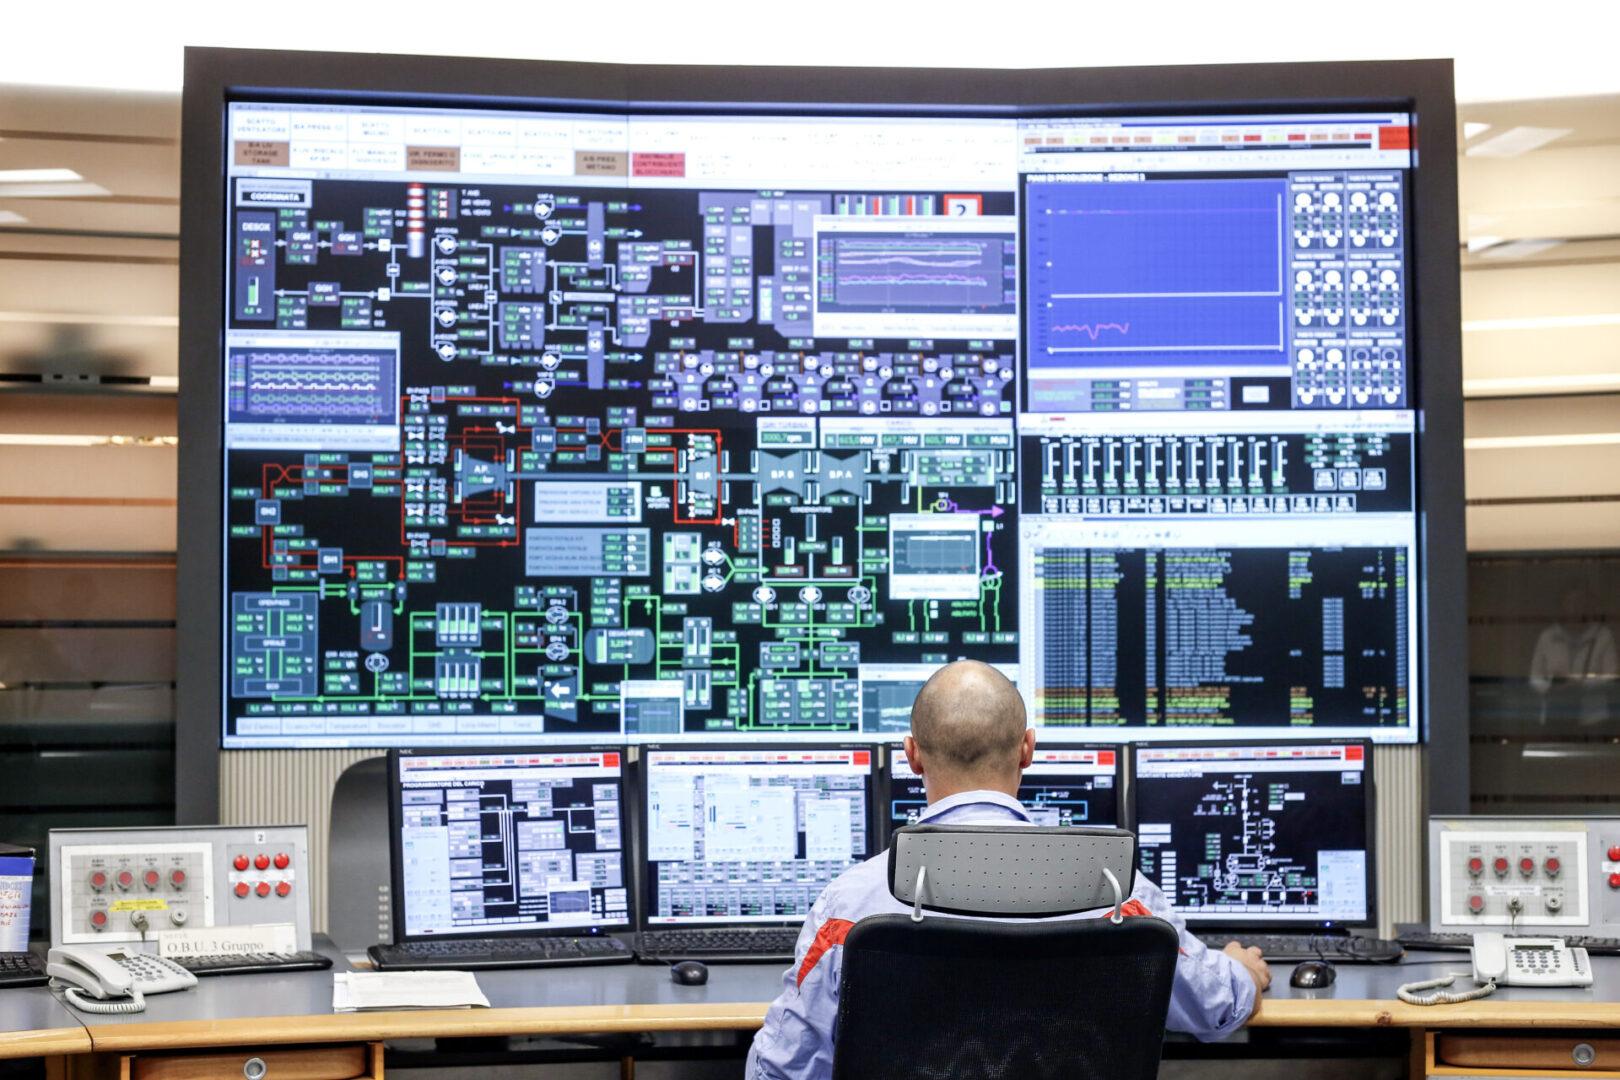 Civitavecchia,,Italy,-,10,October,2014:,Employees,Monitoring,Operational,Data